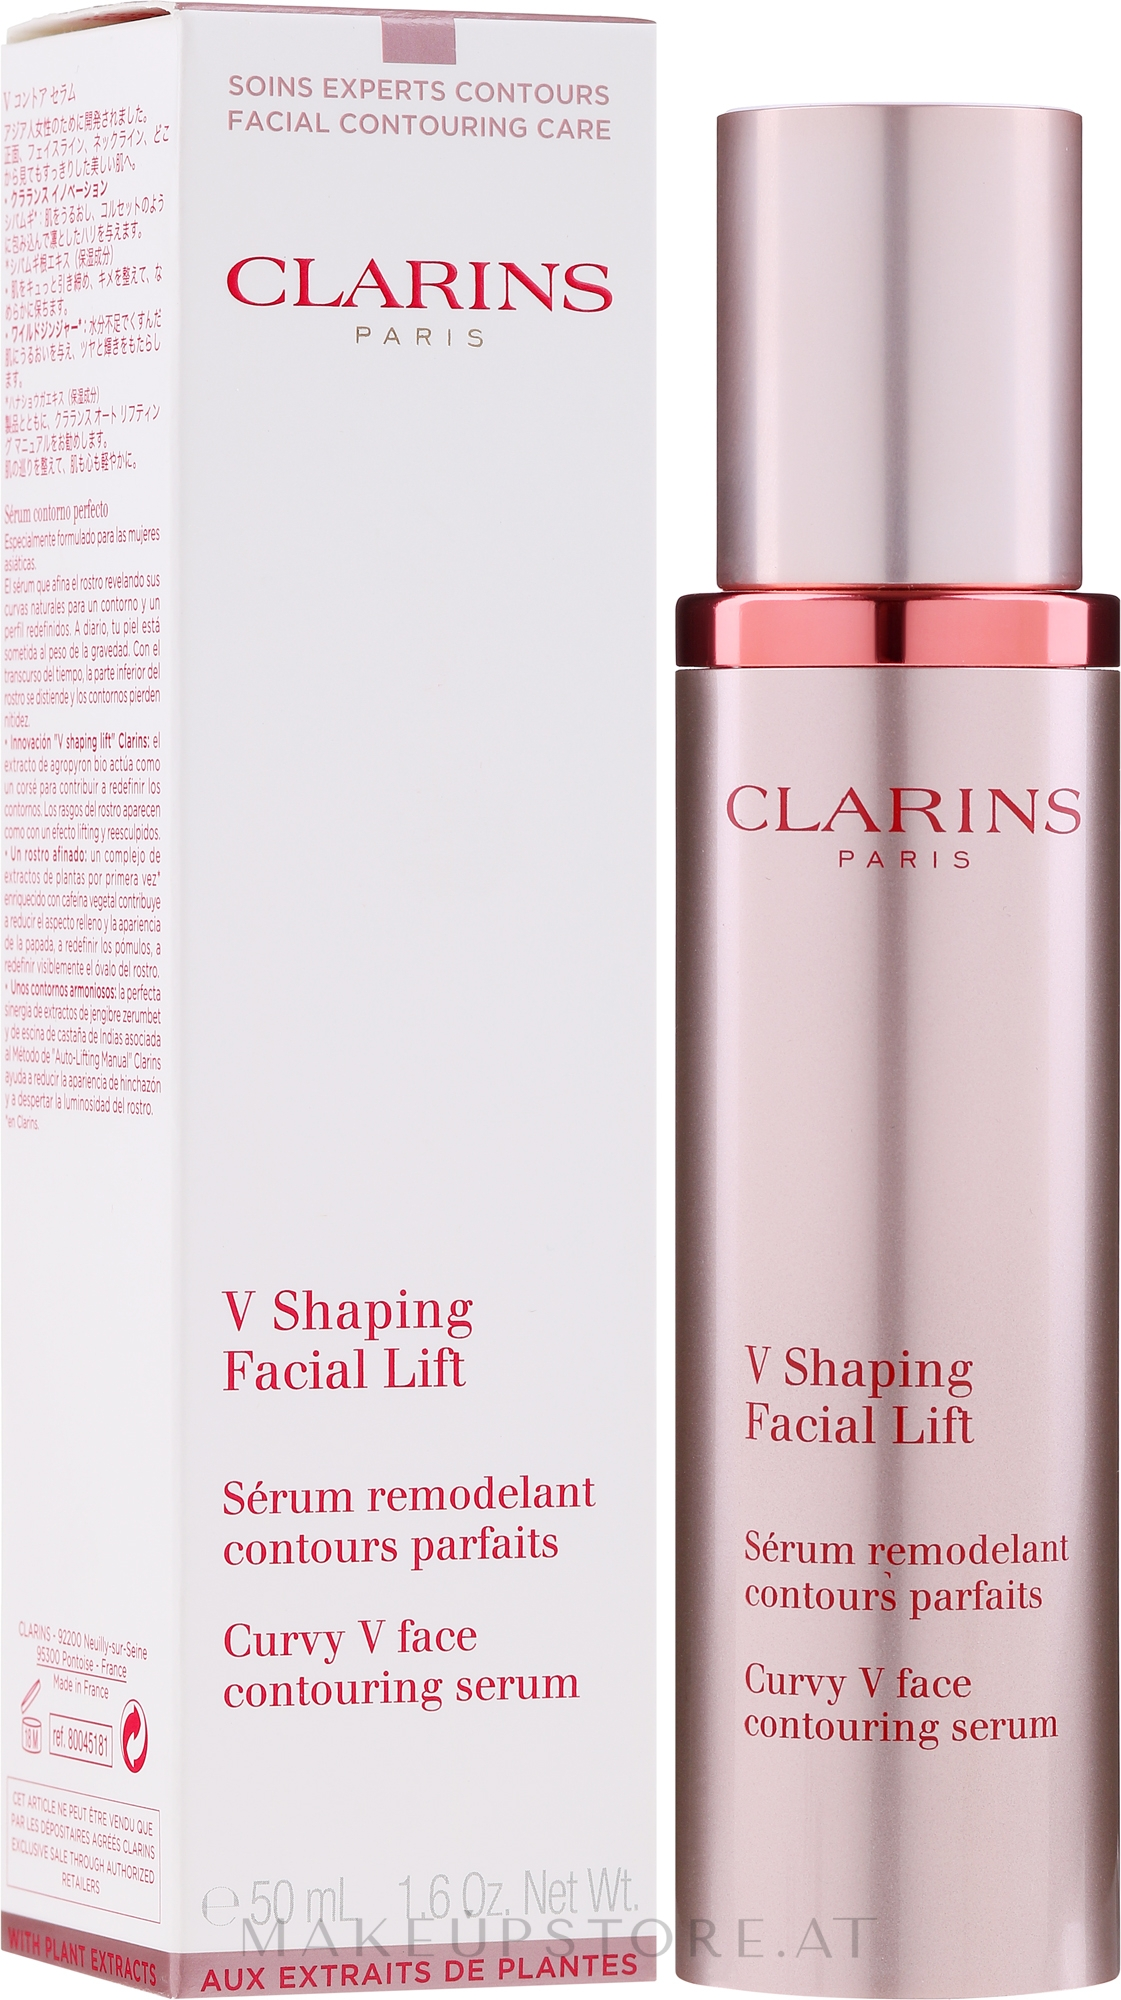 Modellierendes Gesichtsserum mit Lifting-Effekt - Clarins Shaping Facial Lift Total V Contouring Serum — Bild 50 ml